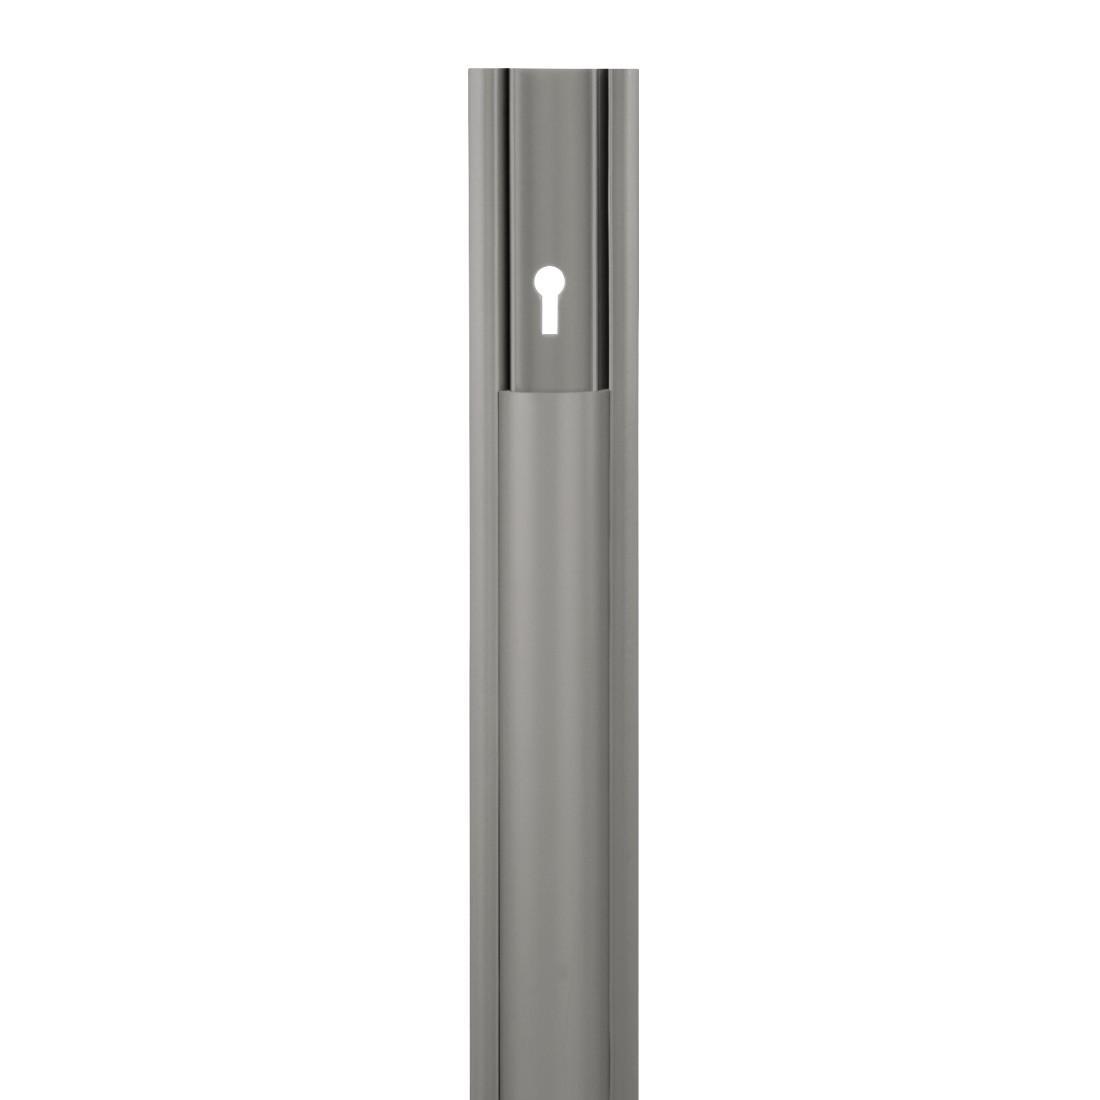 hama pvc kabelkanal halbrund selbstklebend 100 x 3 5 x 0 9 cm bis zu 2 kabel grau 00020616. Black Bedroom Furniture Sets. Home Design Ideas